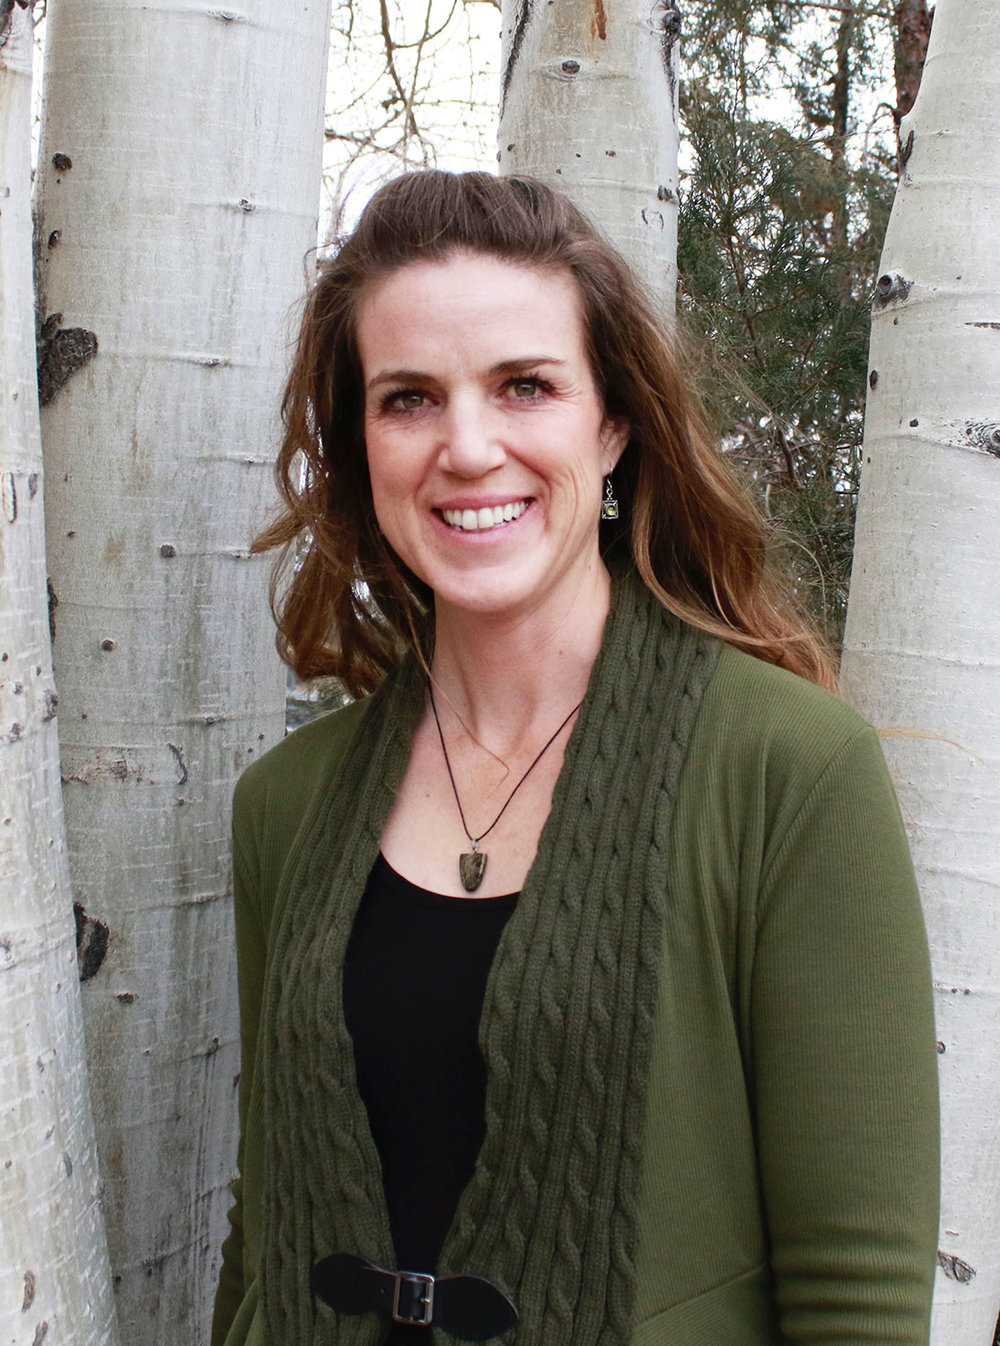 Taos Whole Health Integrative Care - Rachael Barrone, Medical Assistant